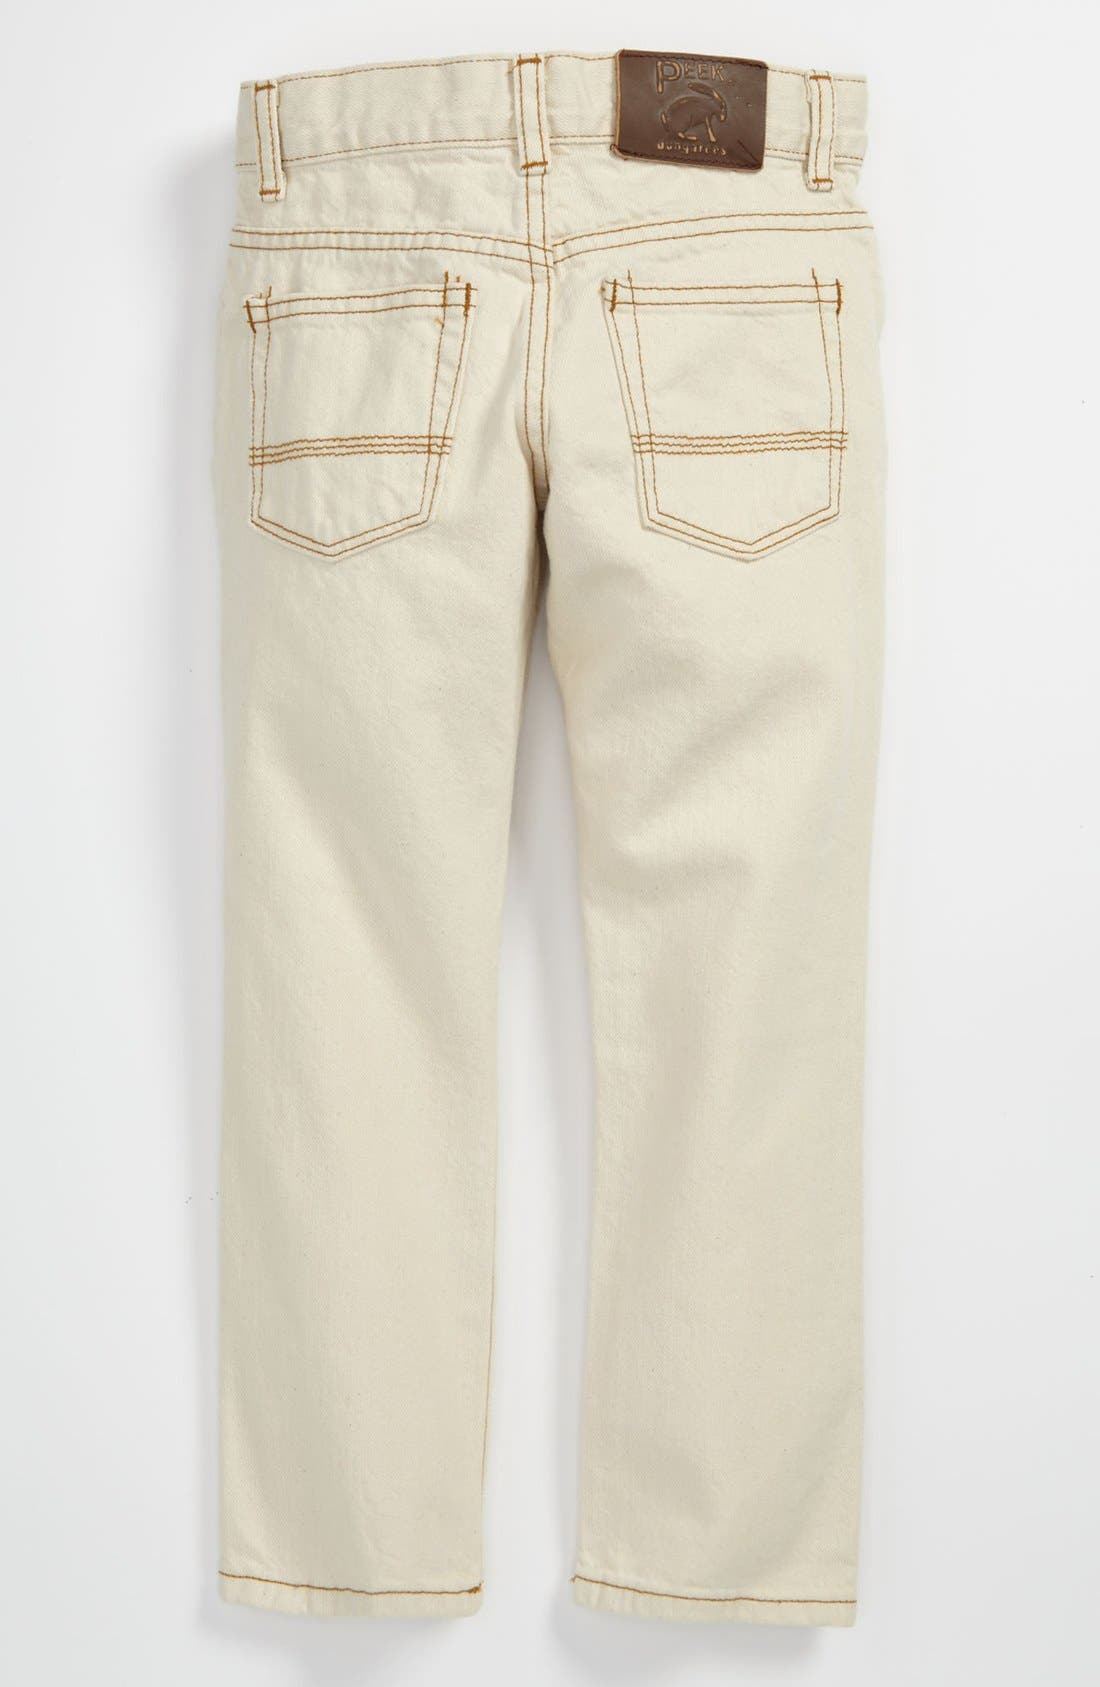 Alternate Image 1 Selected - Peek 'Slouch' Jeans (Toddler, Little Boys & Big Boys)